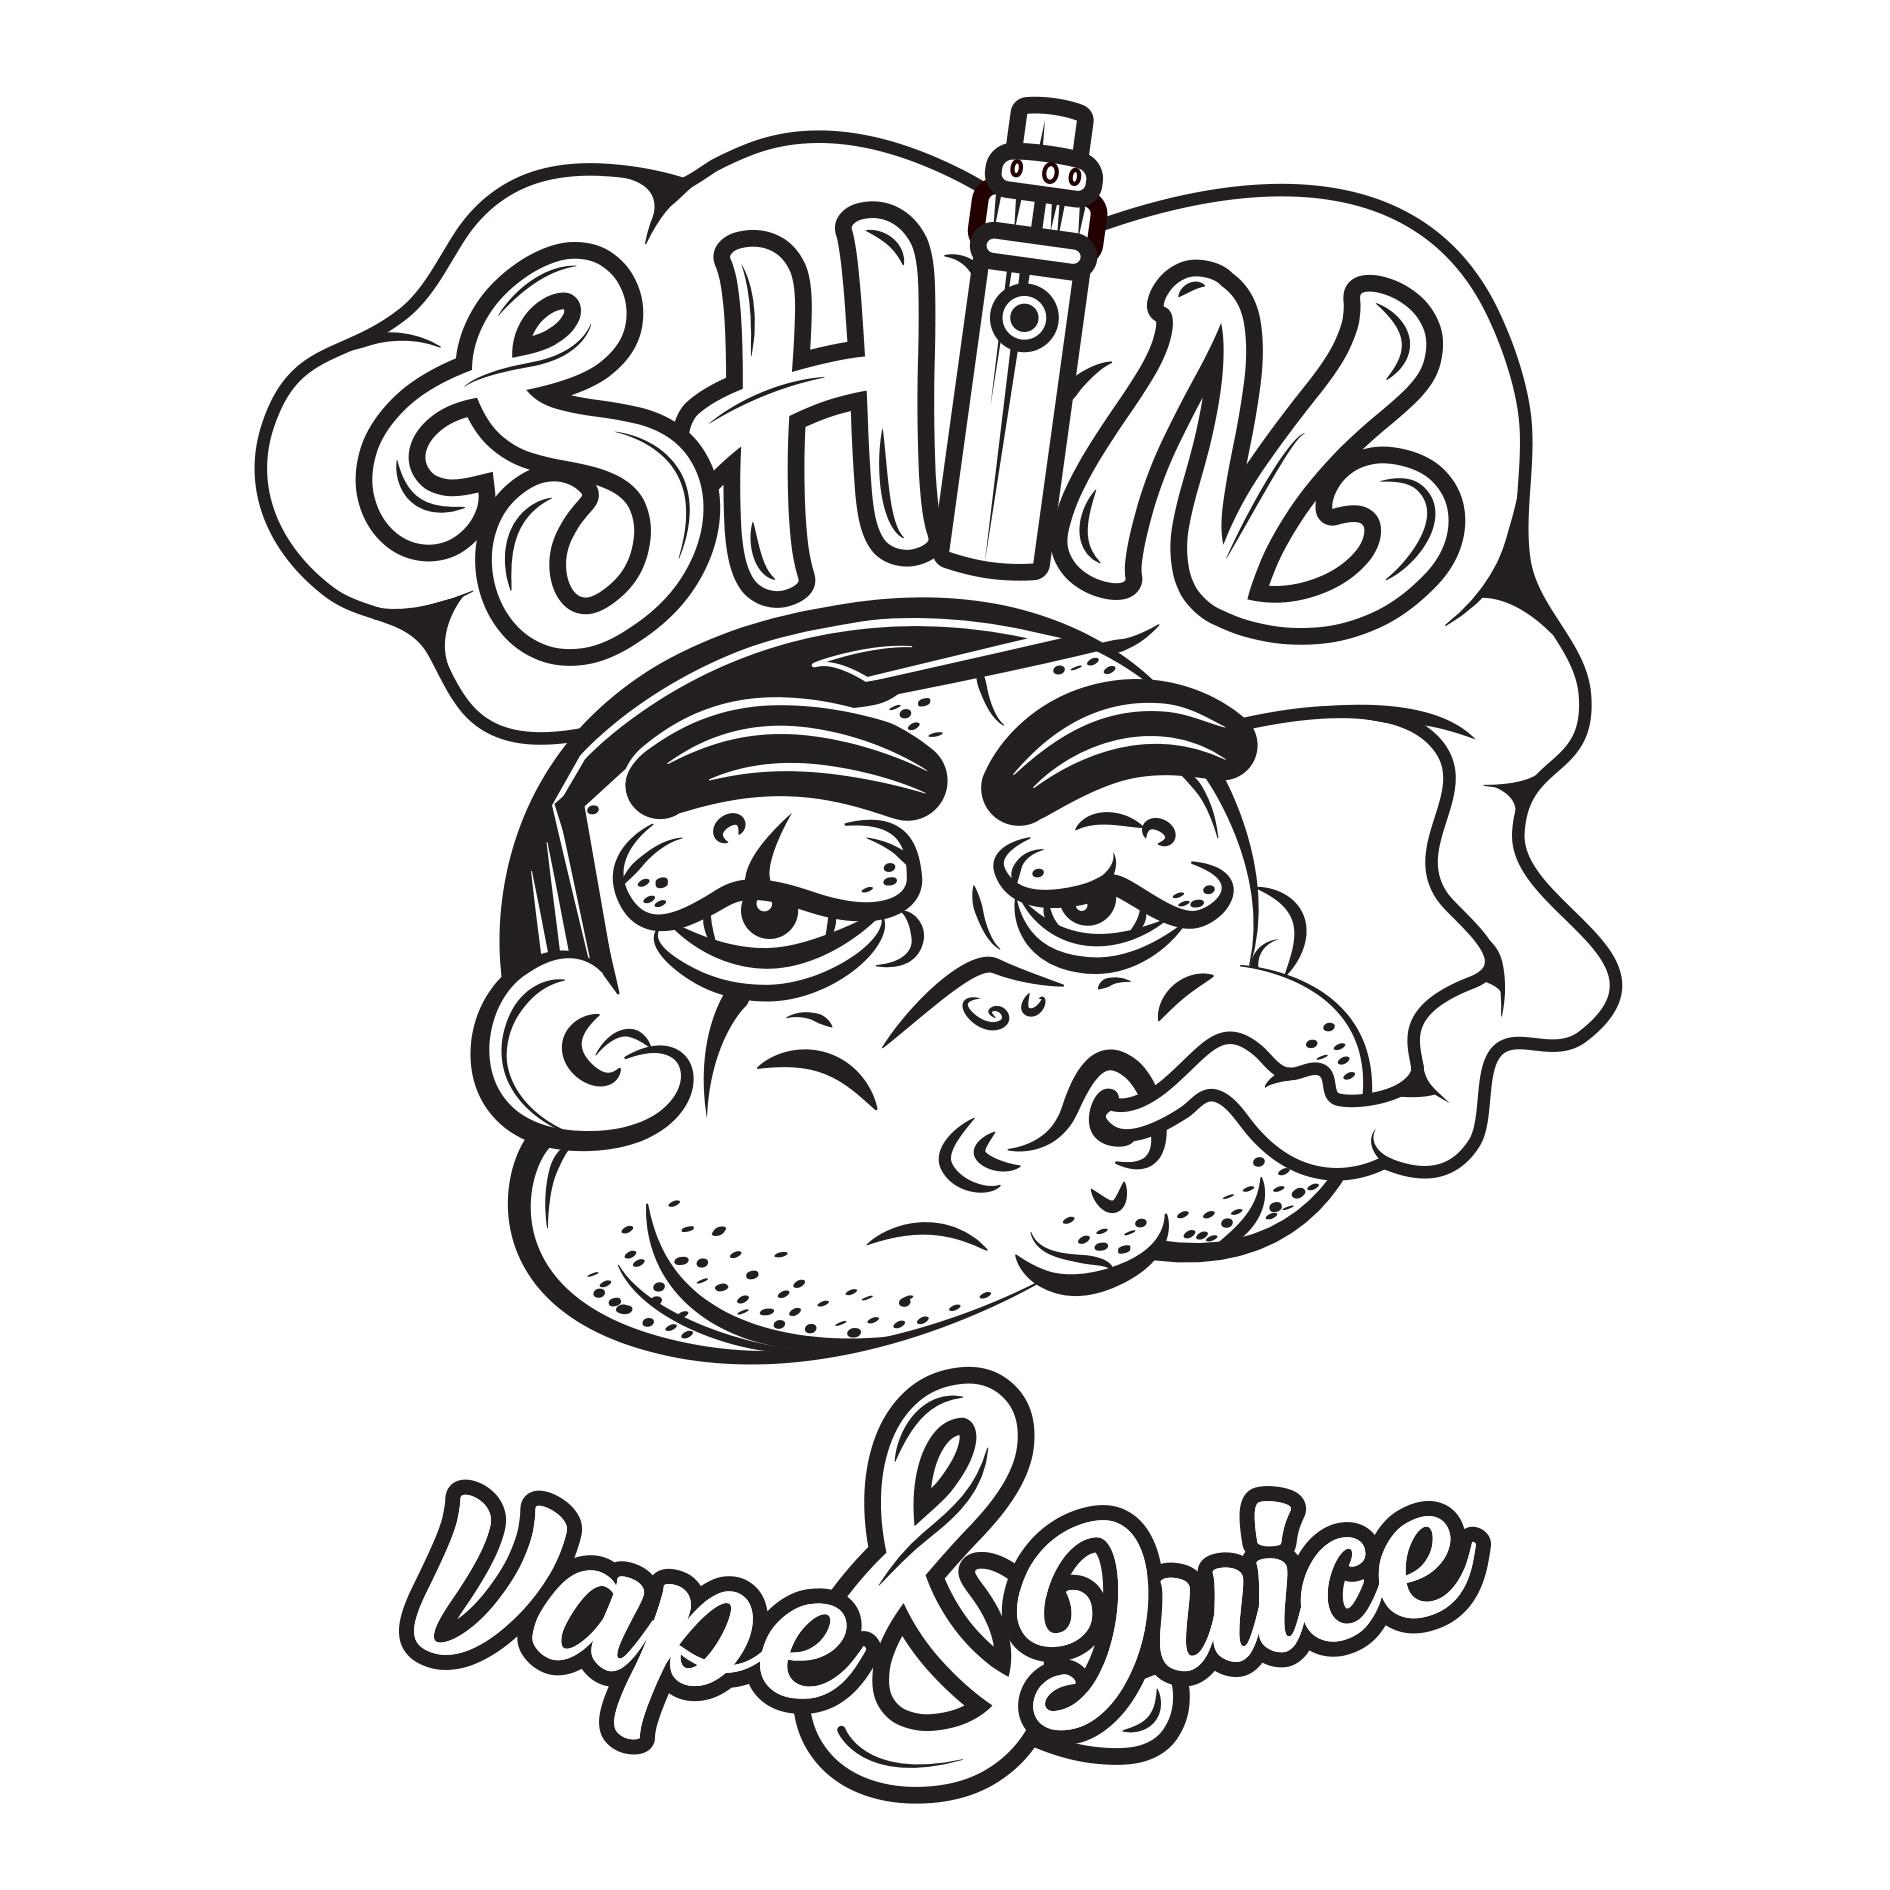 SHIN Vape & Juice   SHIN Vape & Juice is a local vape store in Saigon, Vietnam, started its business in 2019.